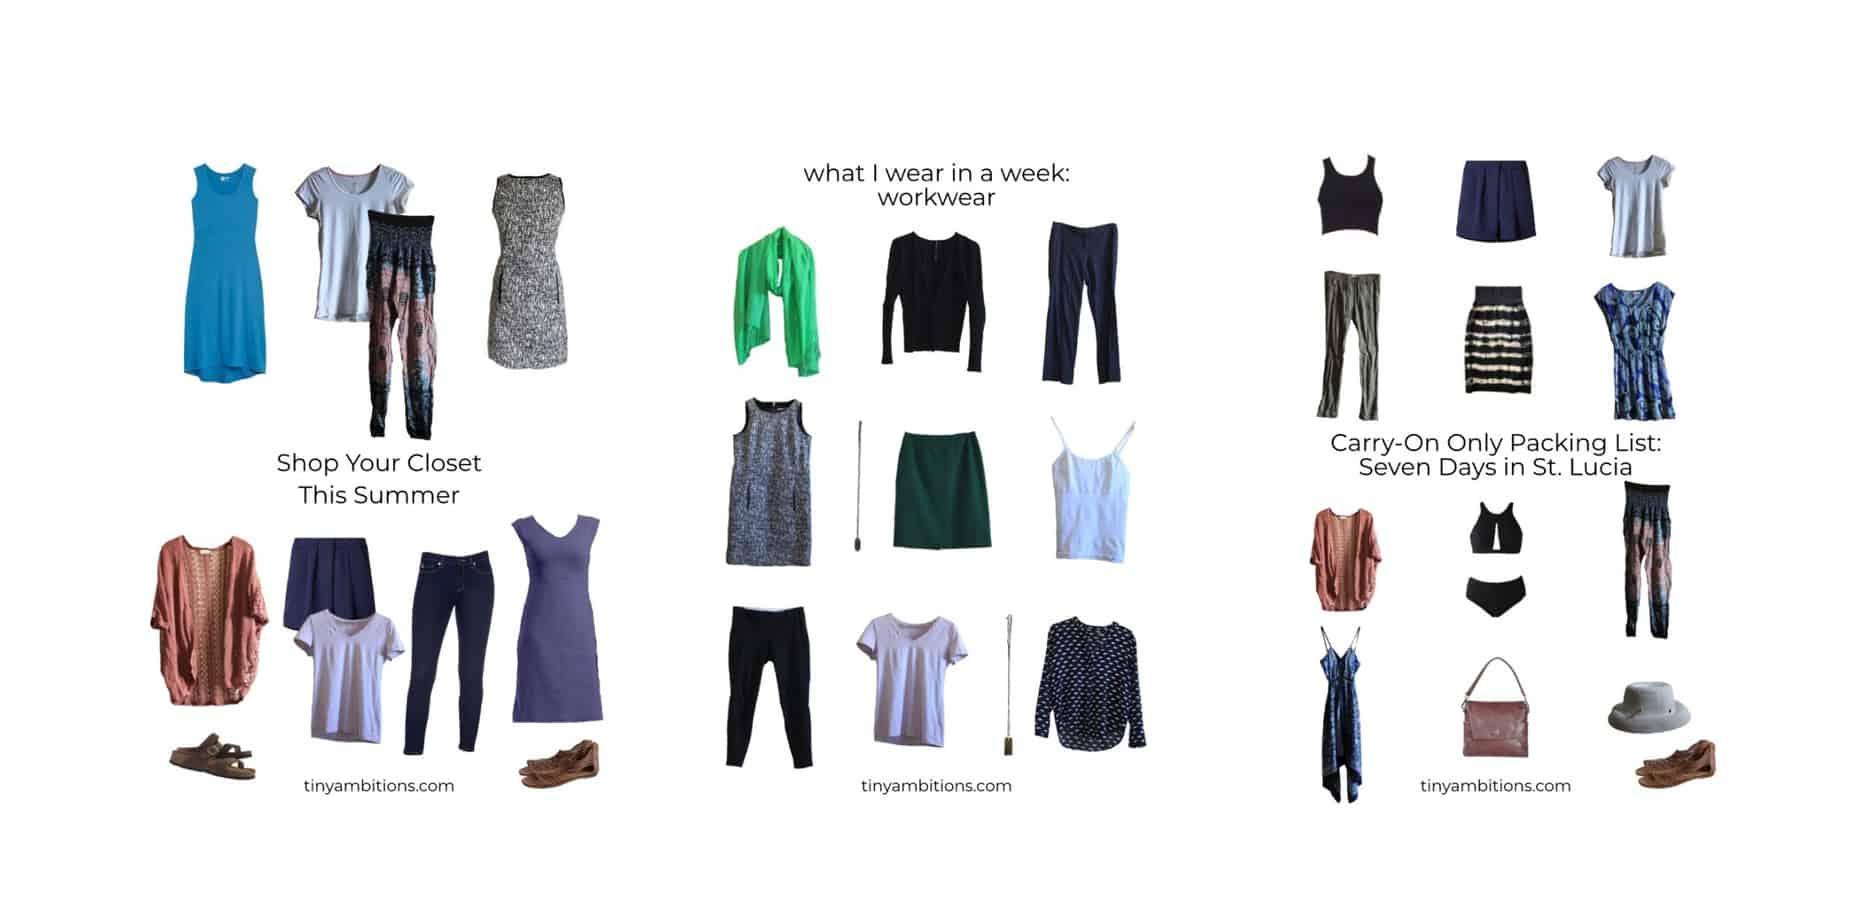 minimalist blogs - tiny ambitions - minimalist blog